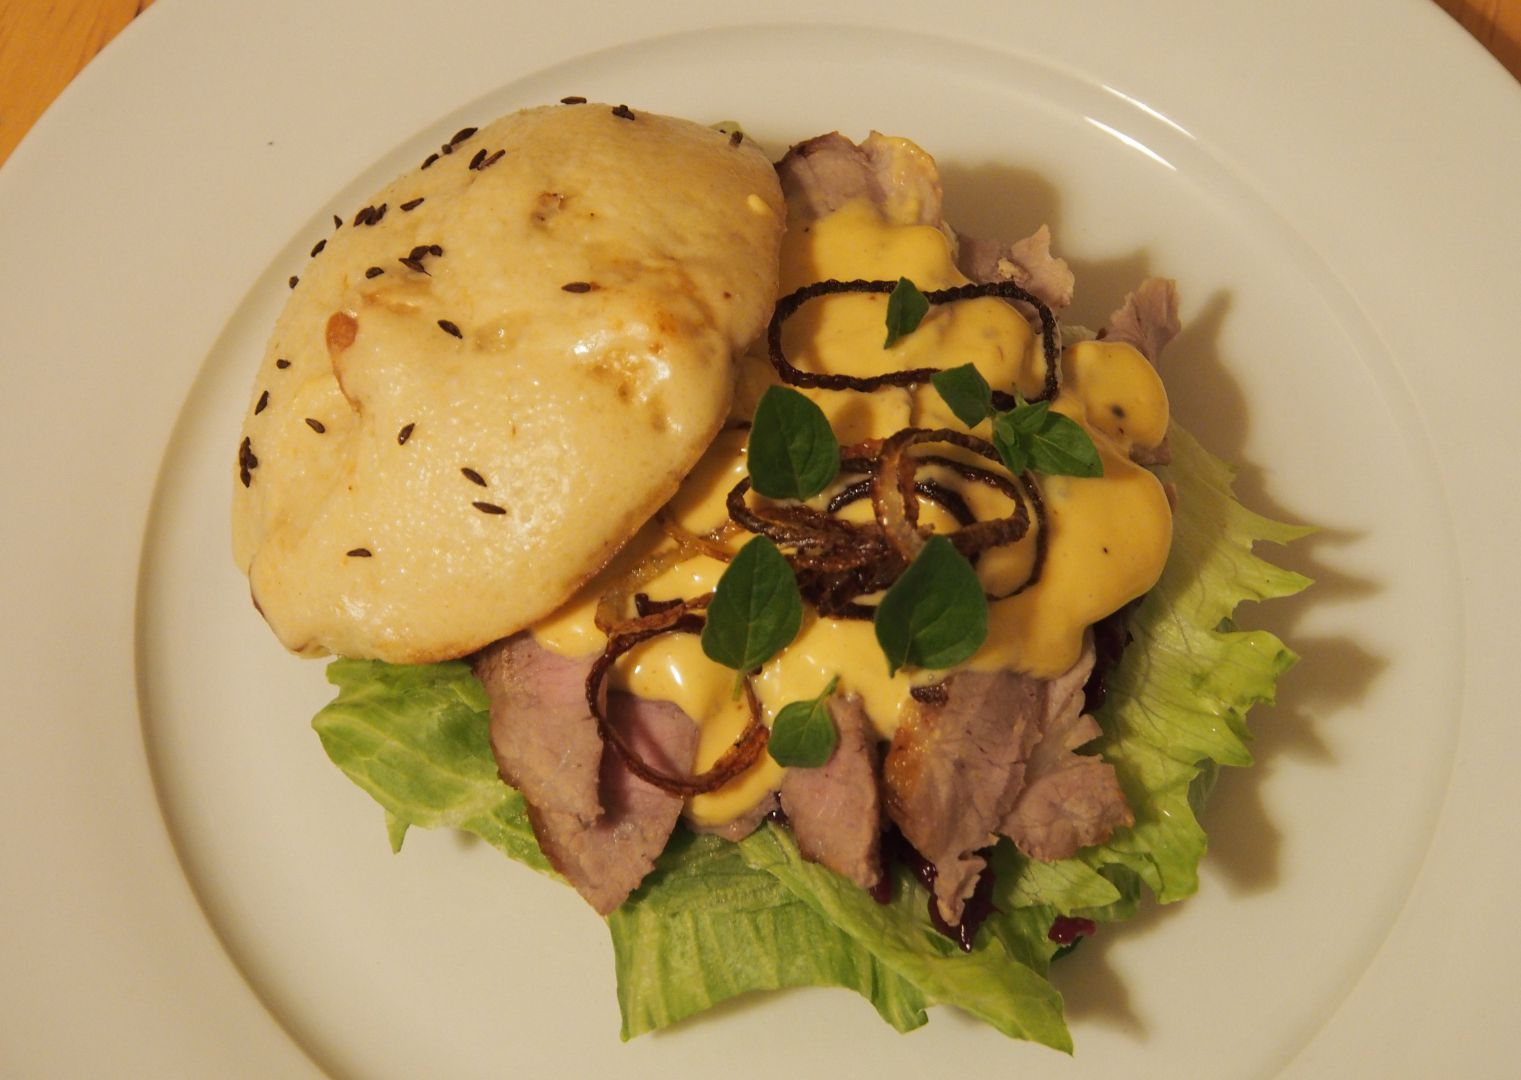 Hamburger vepřo knedlo zelo recept